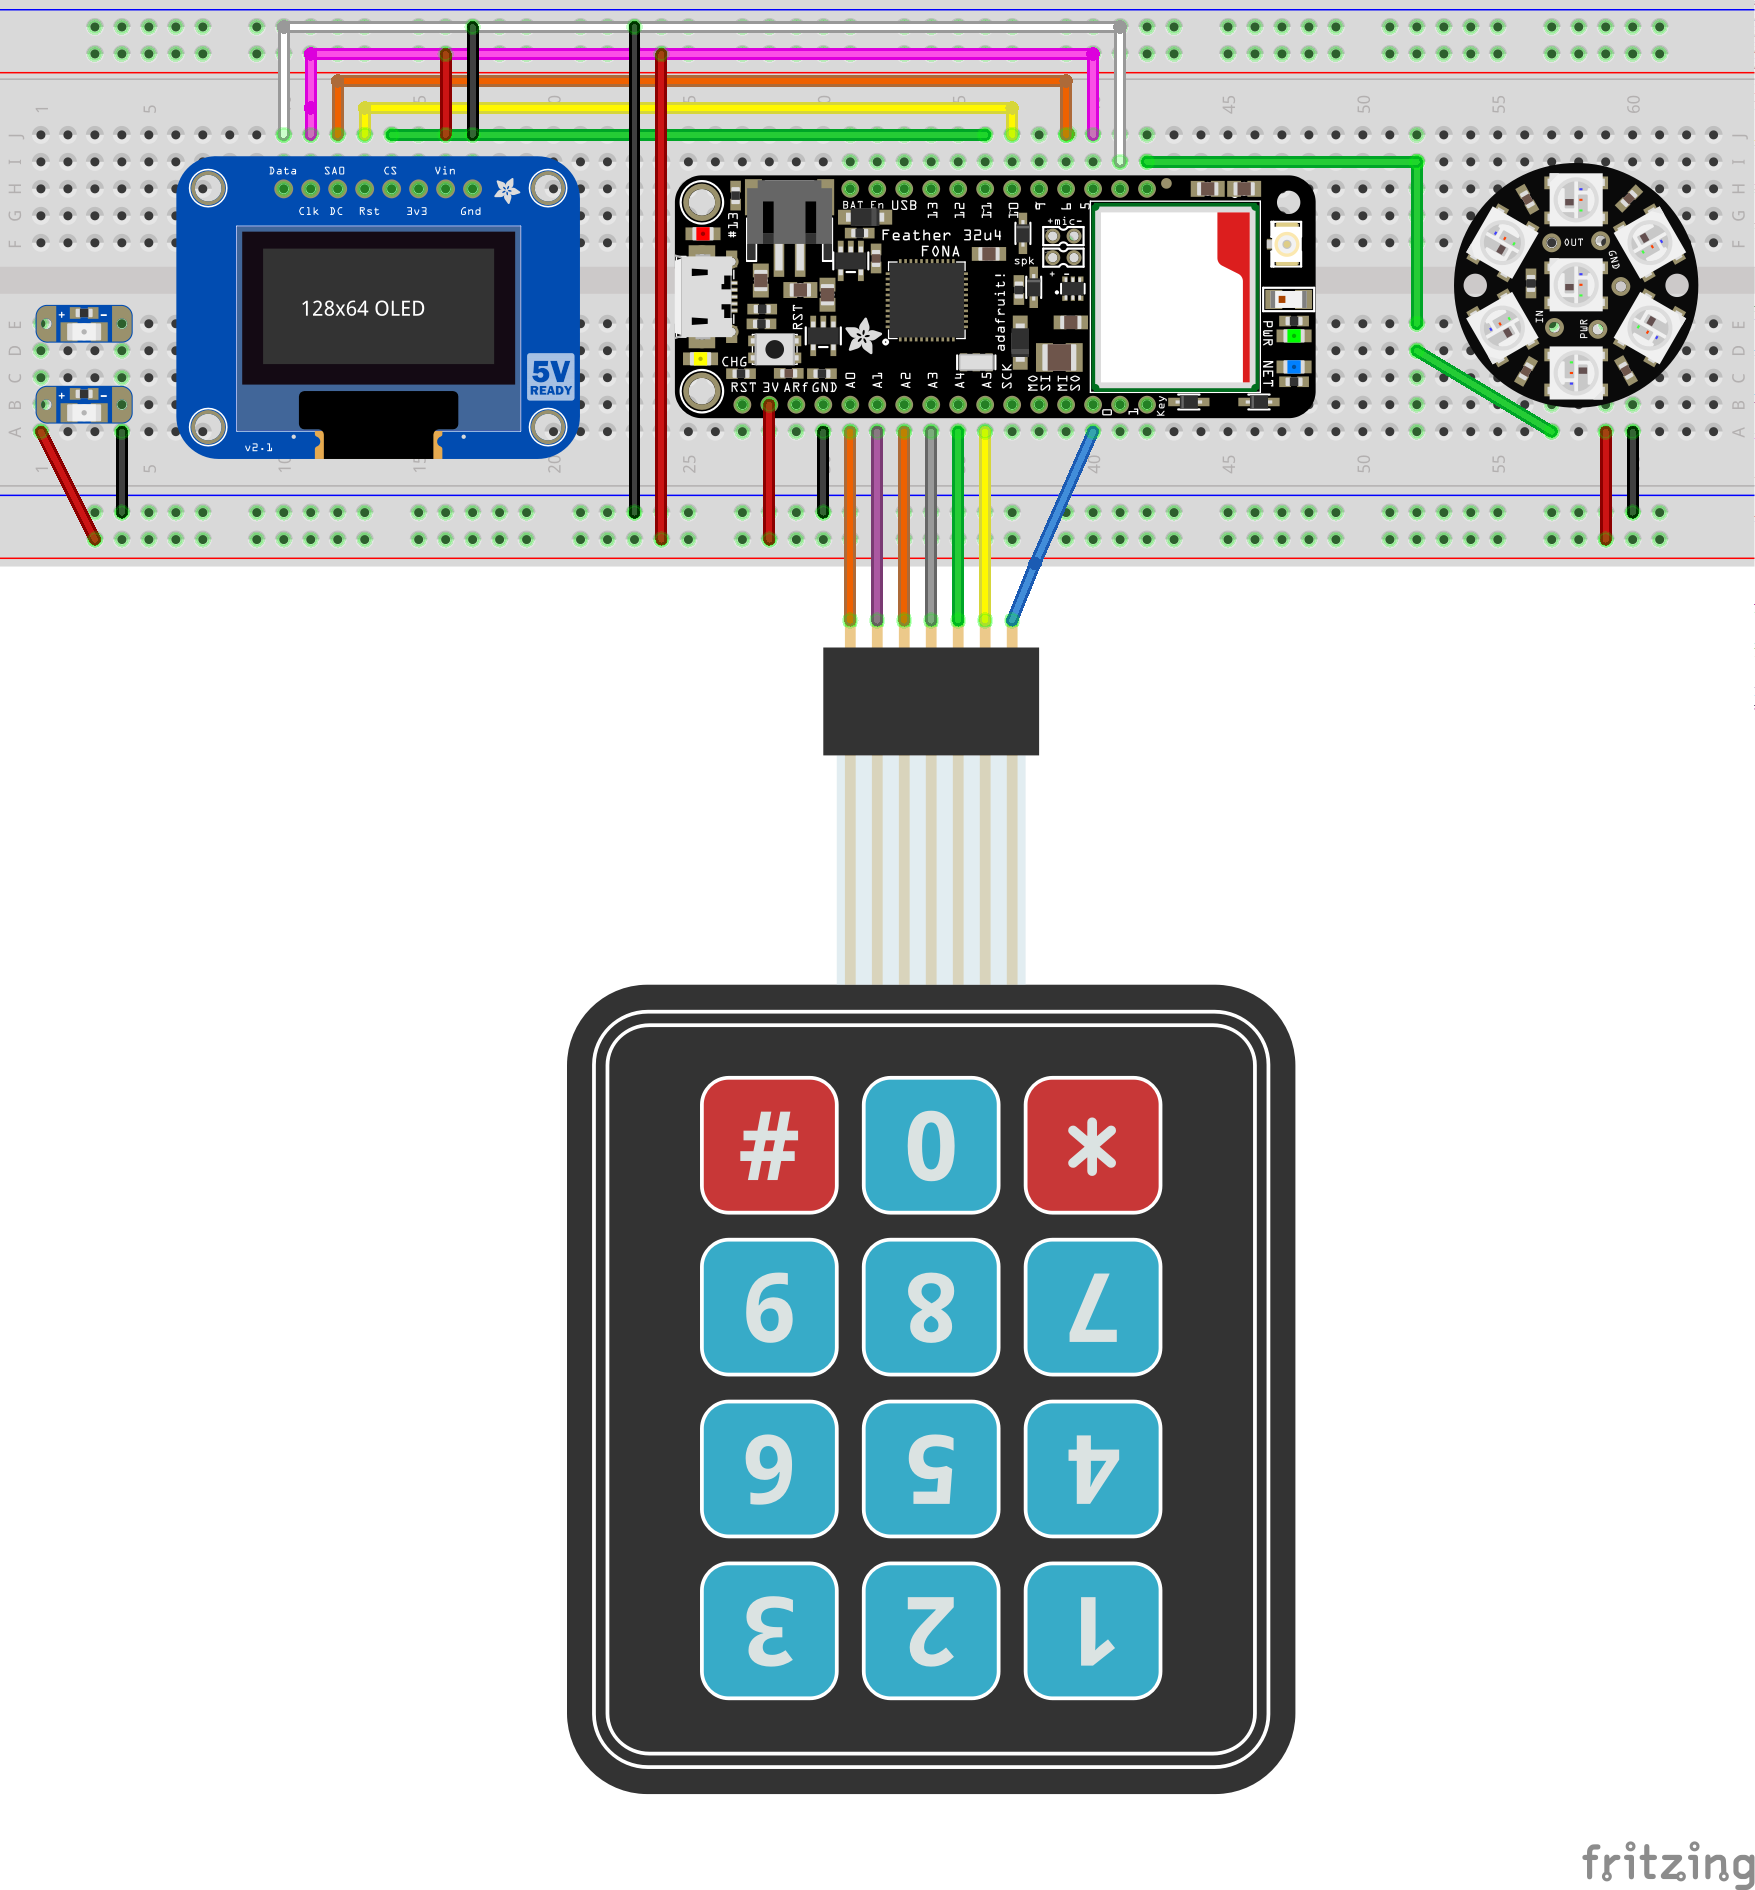 Dieselpunk Cellphone Keypad Circuit Board Of A Mobile Phone Download Technology Fritzing Diagram Minimal Connections Ueyk8ygmcrqzlnumprqx